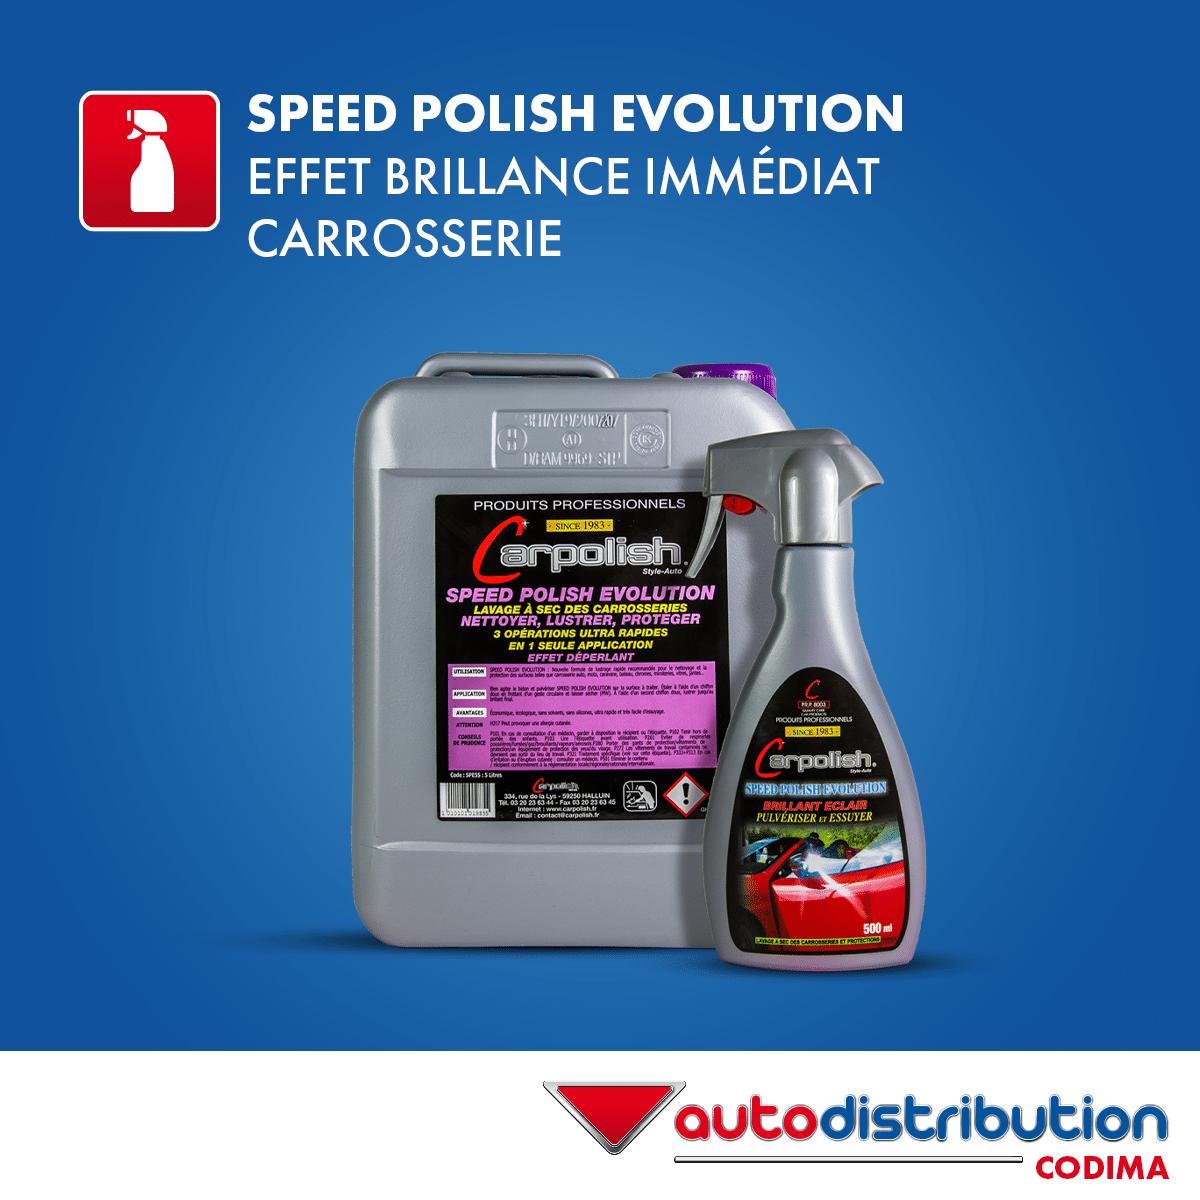 Carpolish Speed Polish Evolution